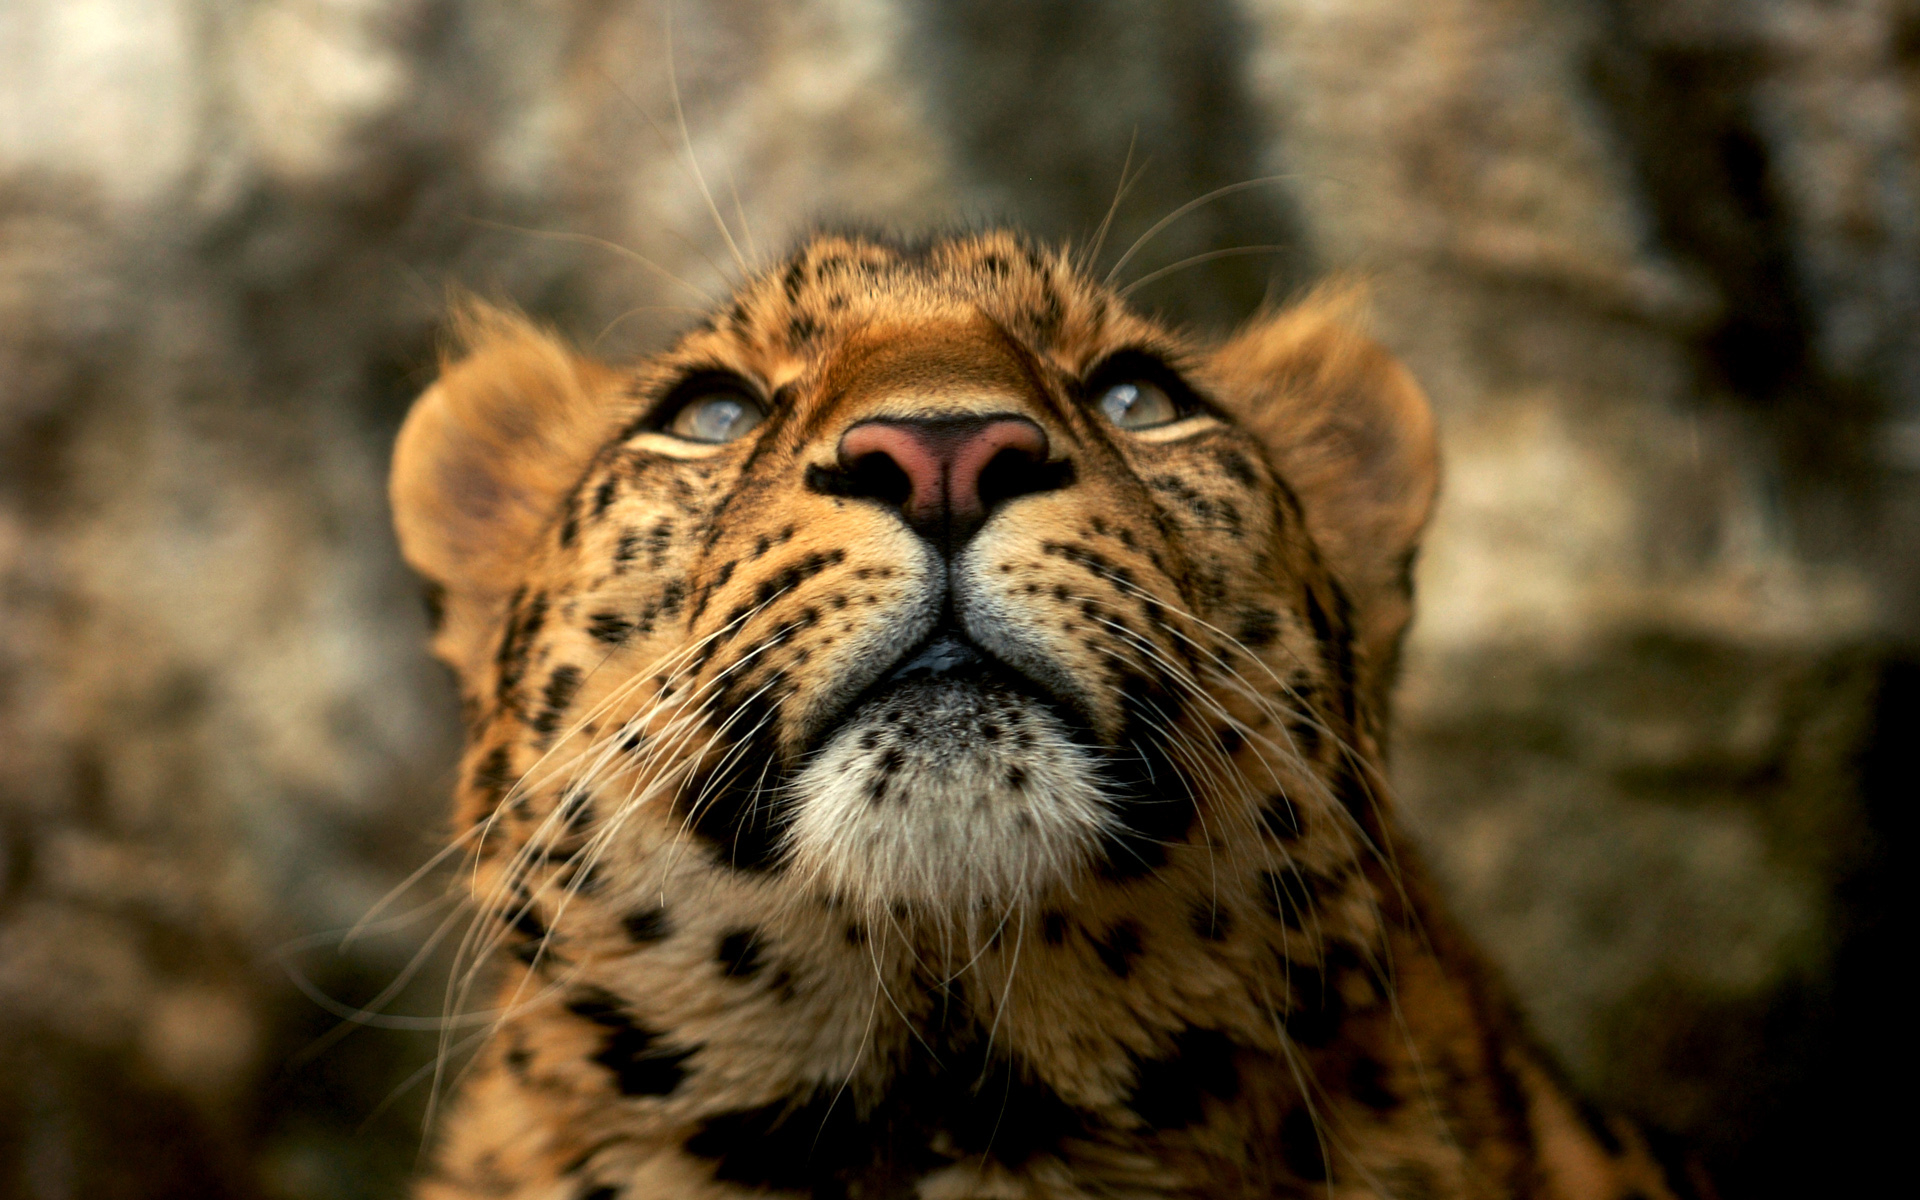 3d Name Live Wallpaper Download Leopard Wallpapers Hd Desktop Wallpapers 4k Hd